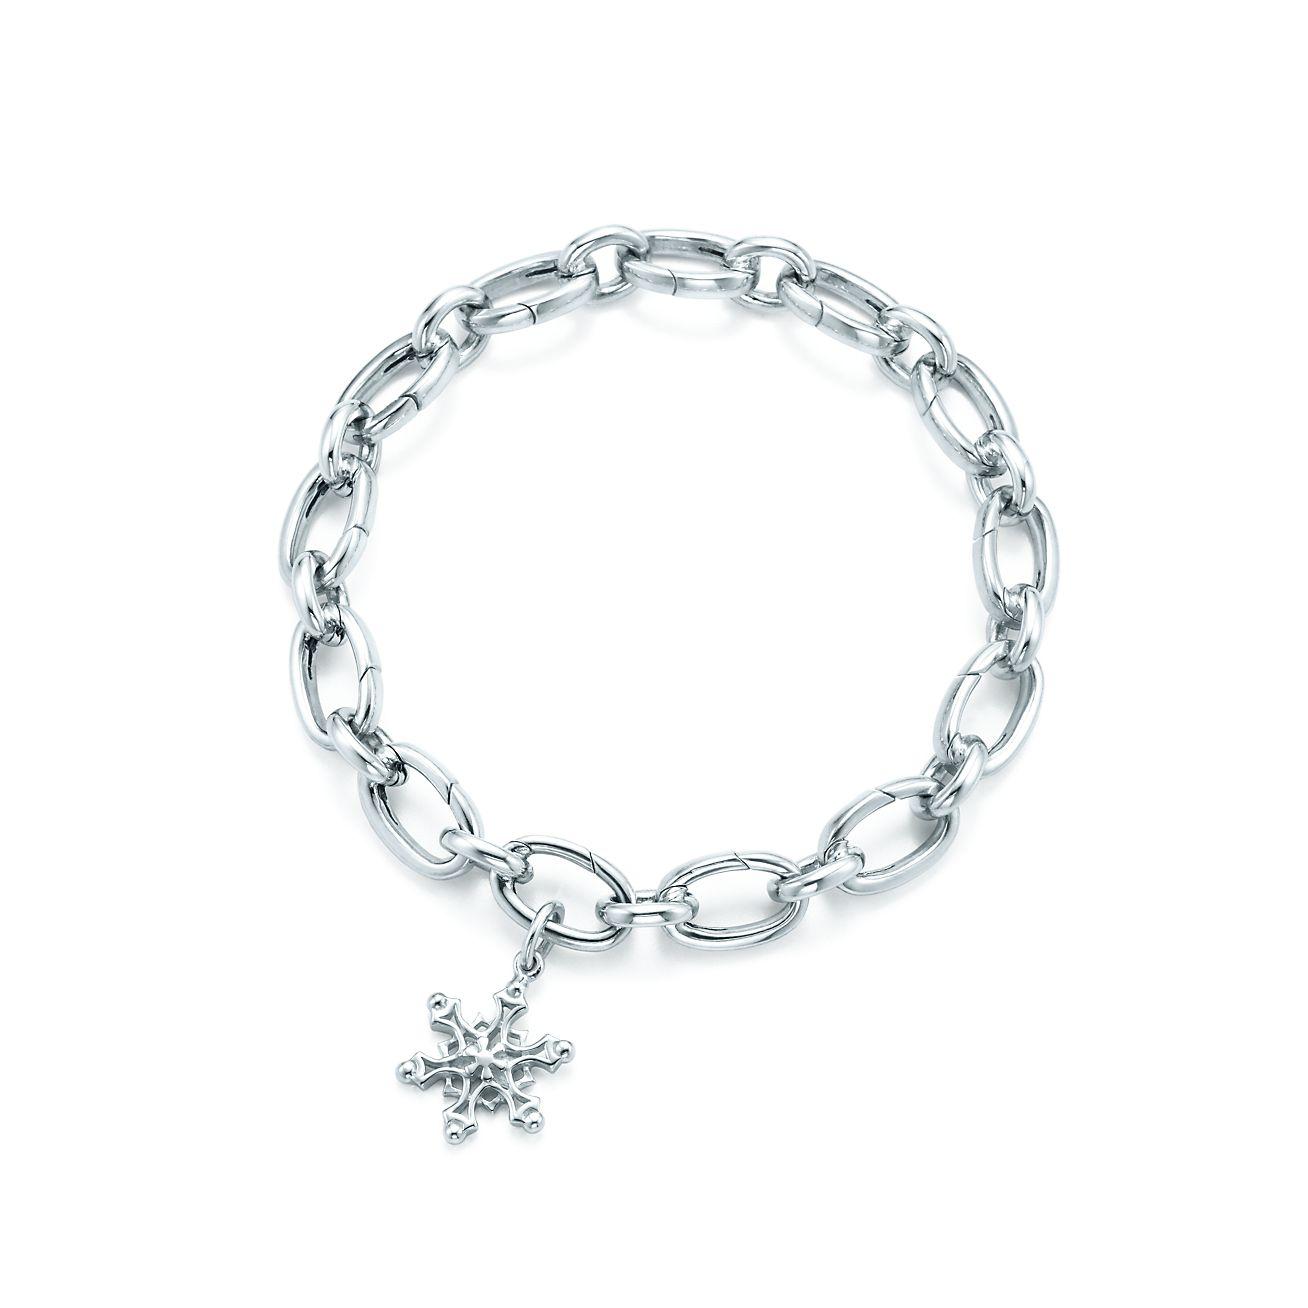 Snowflake Charm And Bracelet